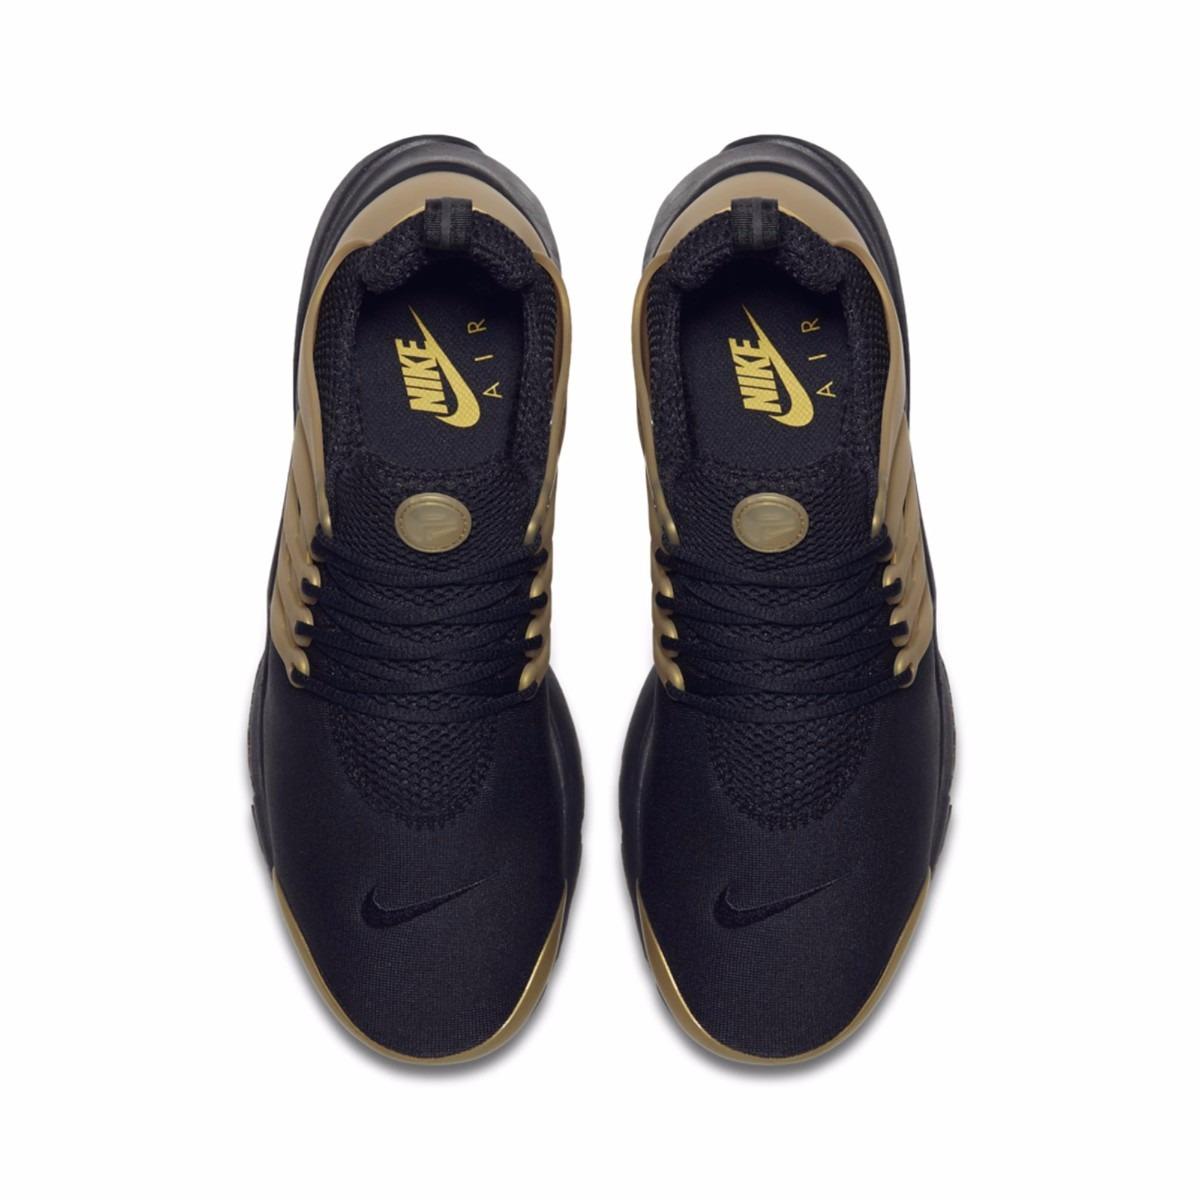 c4053376bb128 tênis nike air presto essential - conforto corrida fitness. Carregando zoom.